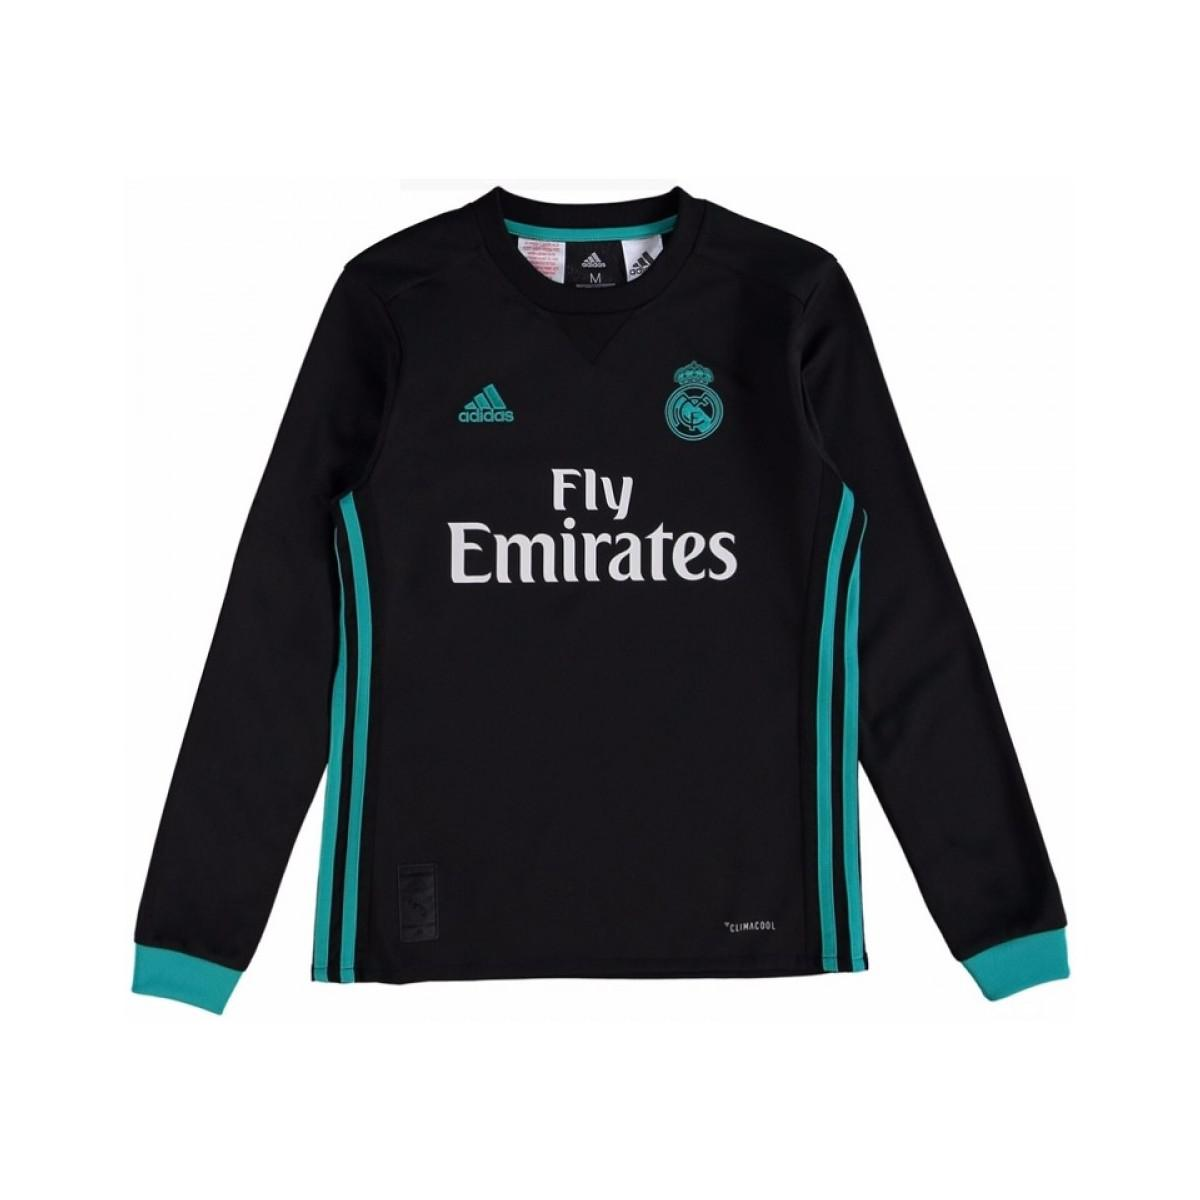 623b2bf5e Adidas - 2017-18 Real Madrid Away Long Sleeve Shirt - Kids (modric 10. View  fullscreen